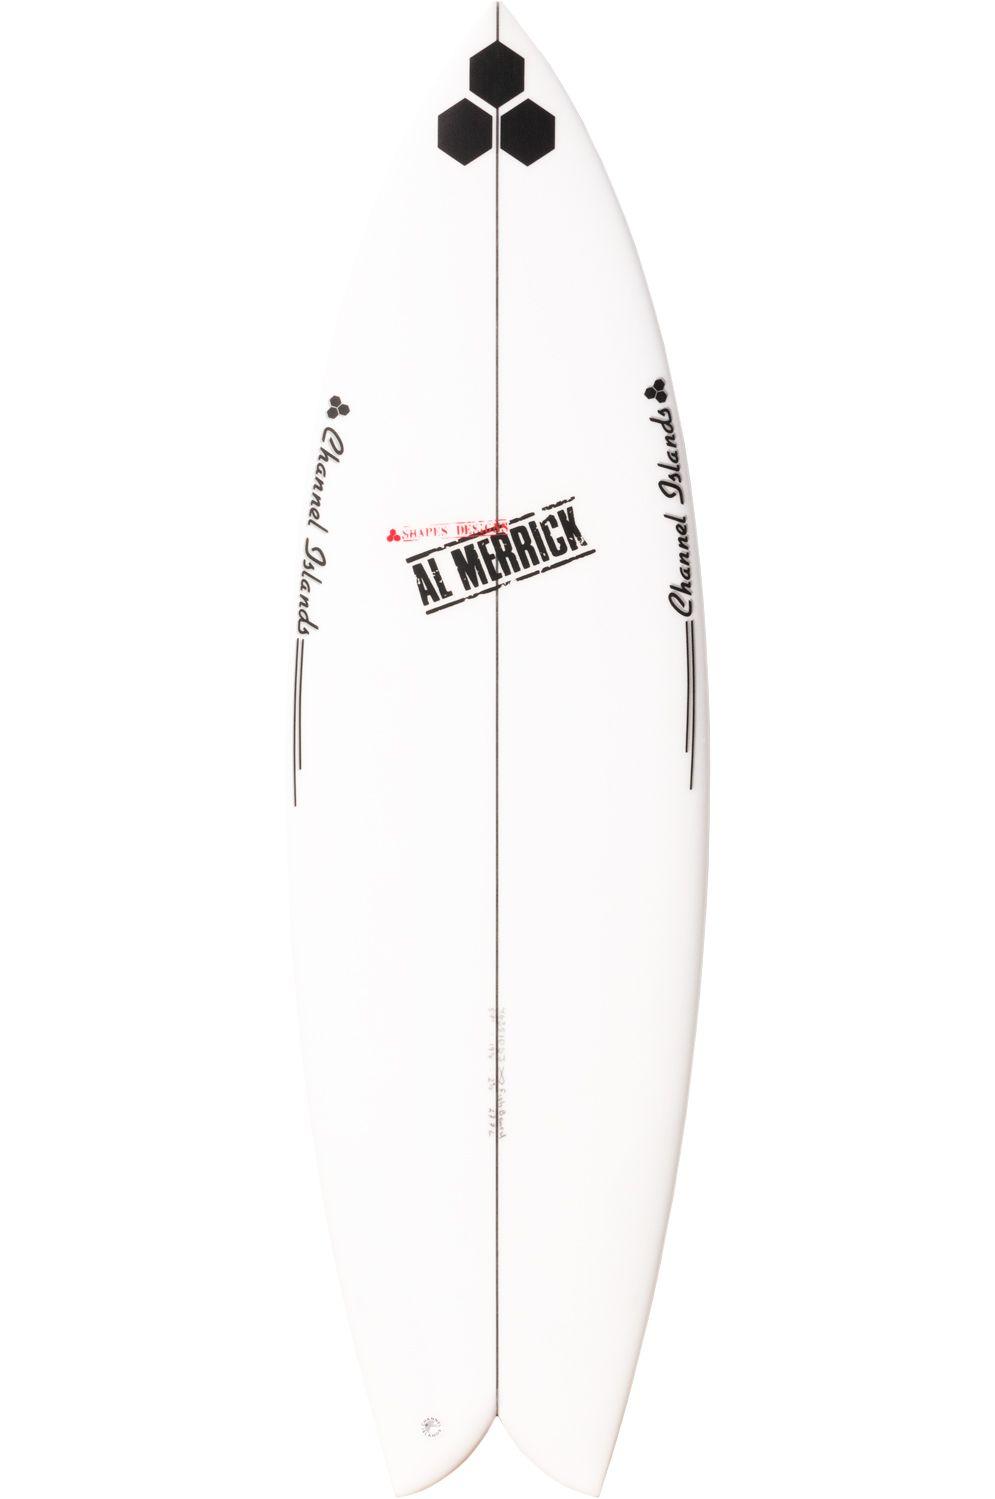 Prancha Surf Al Merrick 5'5 FISHBEARD Fish Tail - White Futures Twin 5ft5